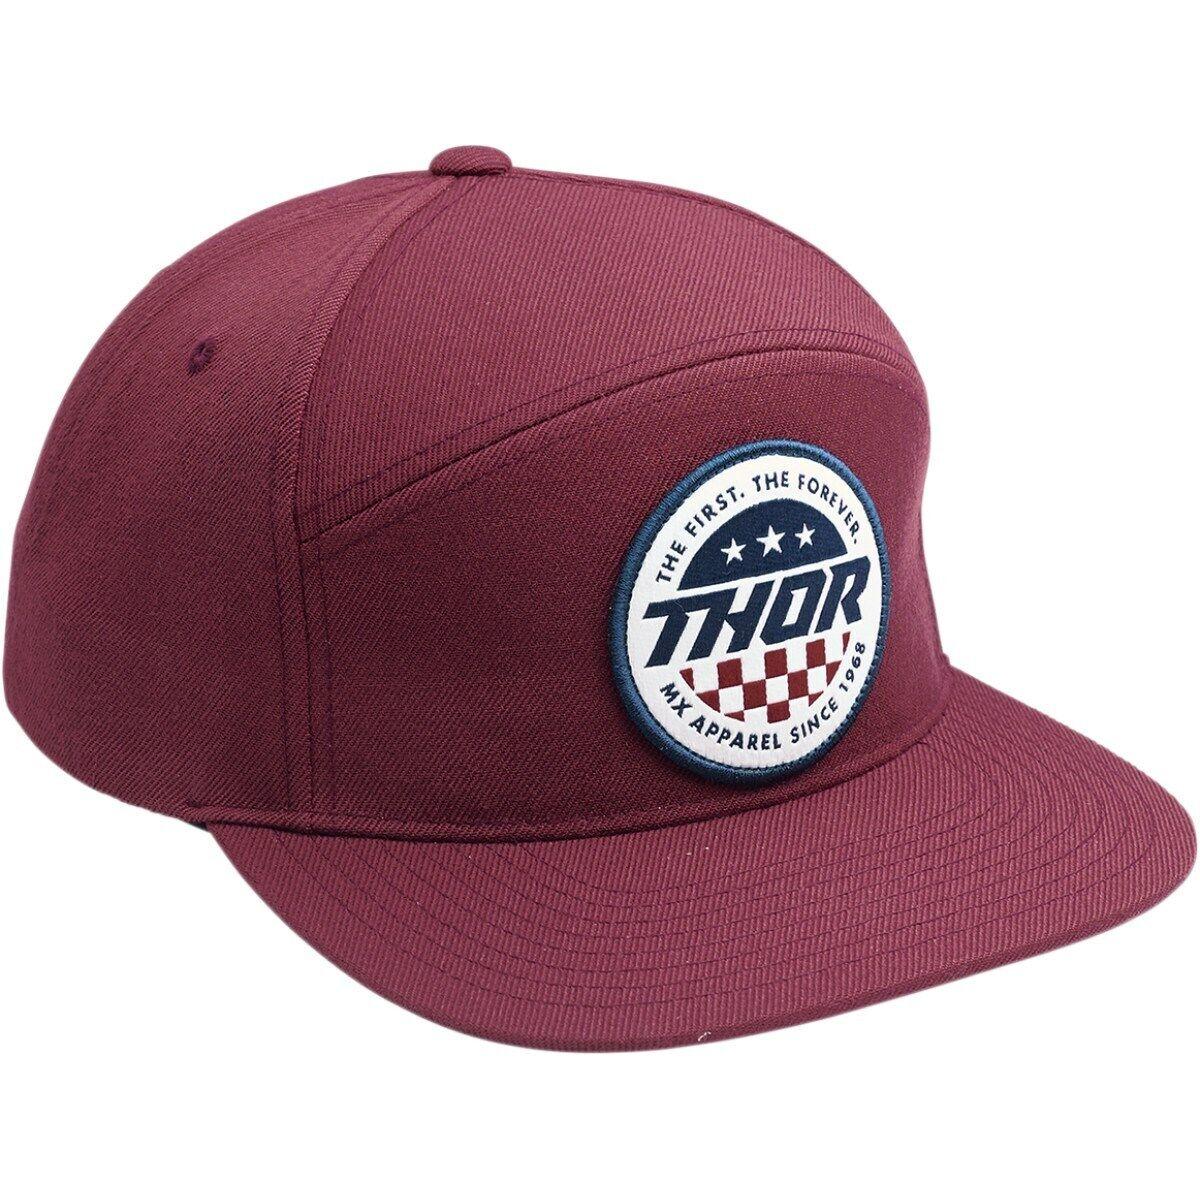 Thor Patriot Snapback Schirmmütze Base Cap